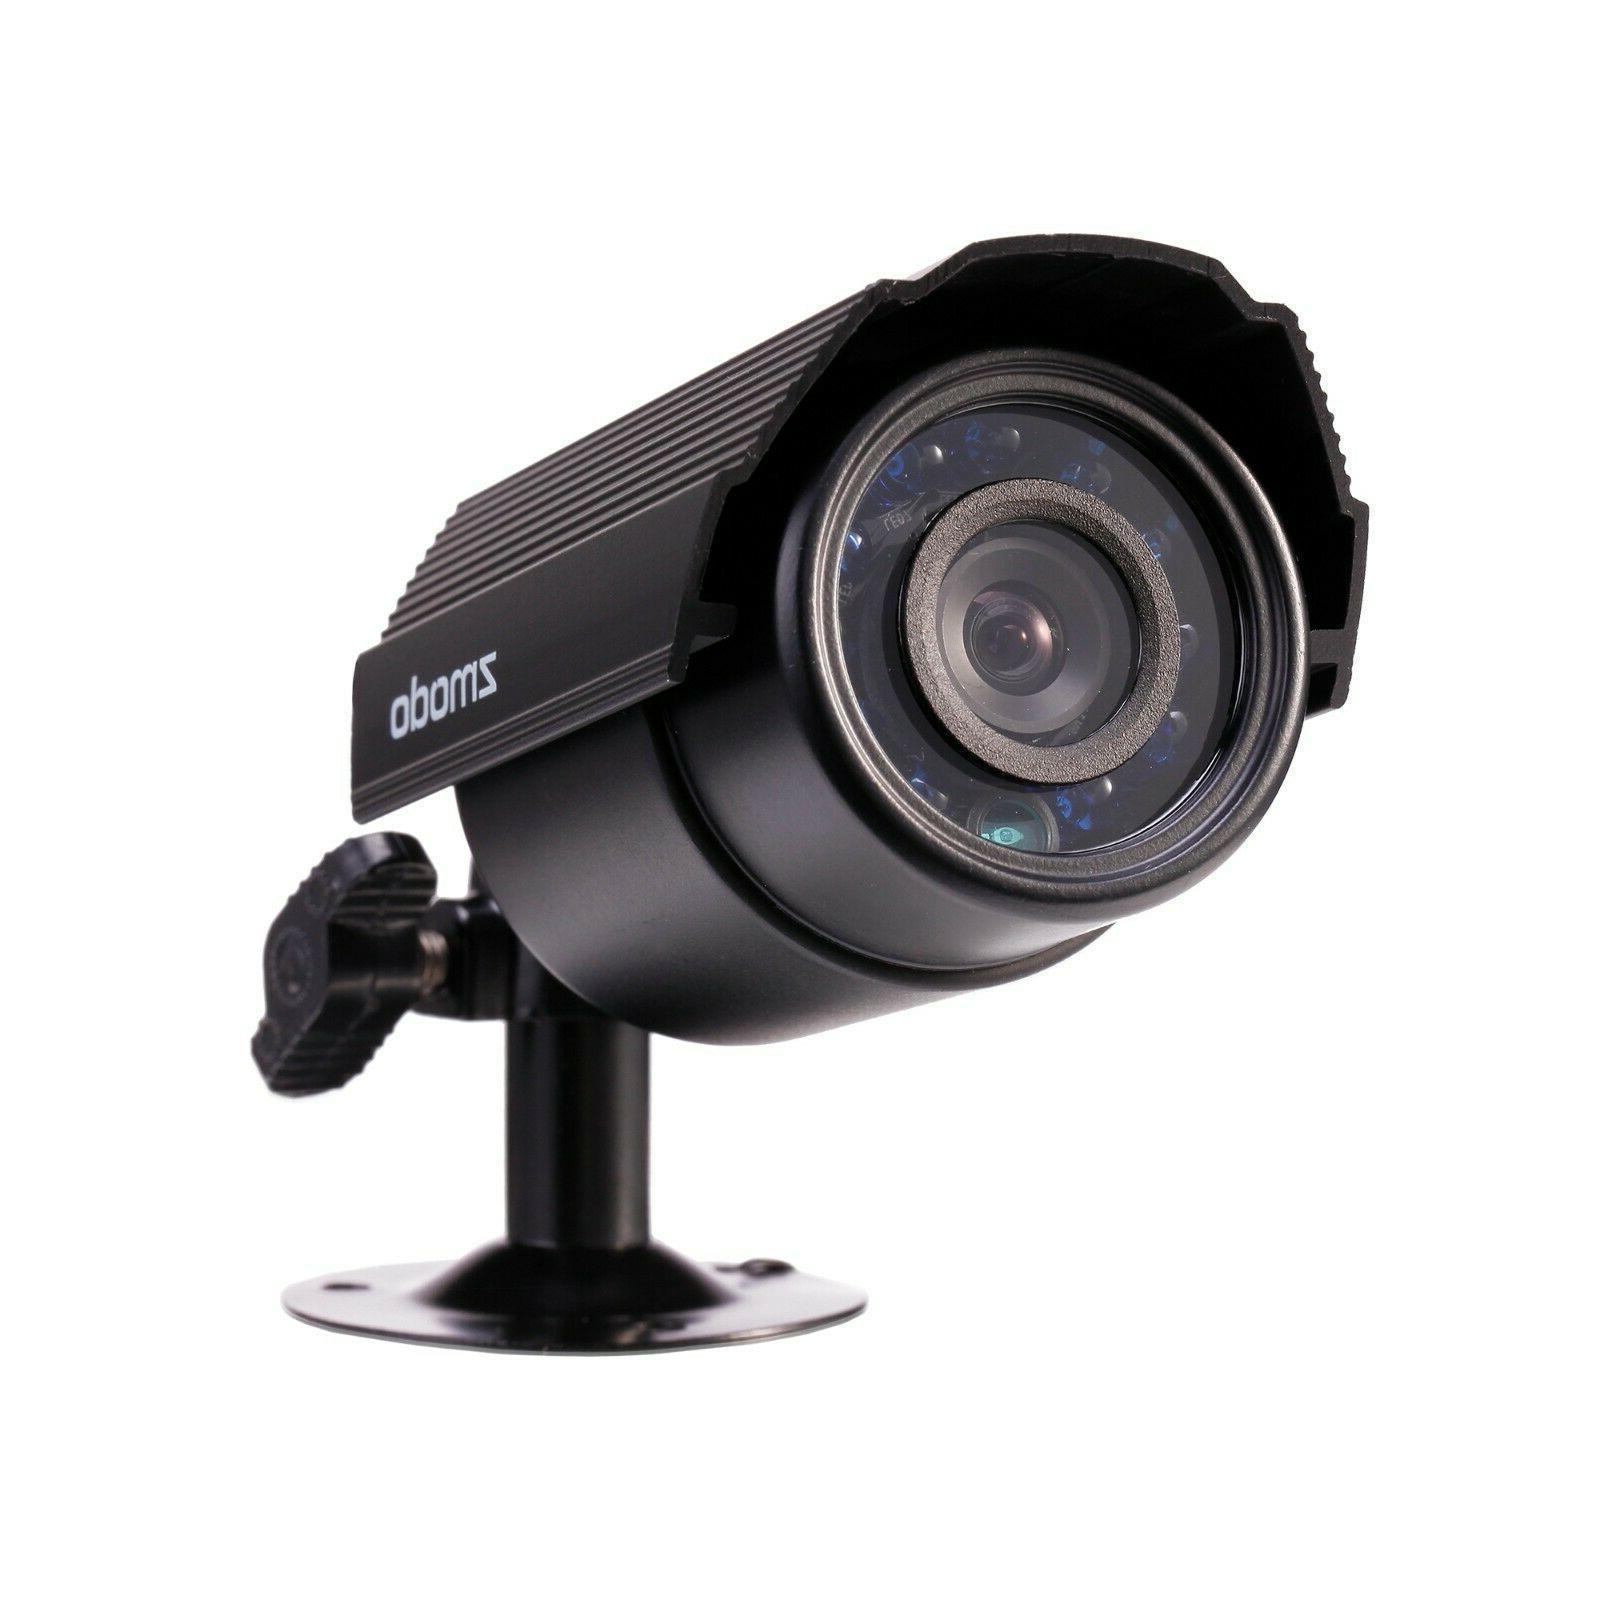 Zmodo Analog CCTV Security Cameras